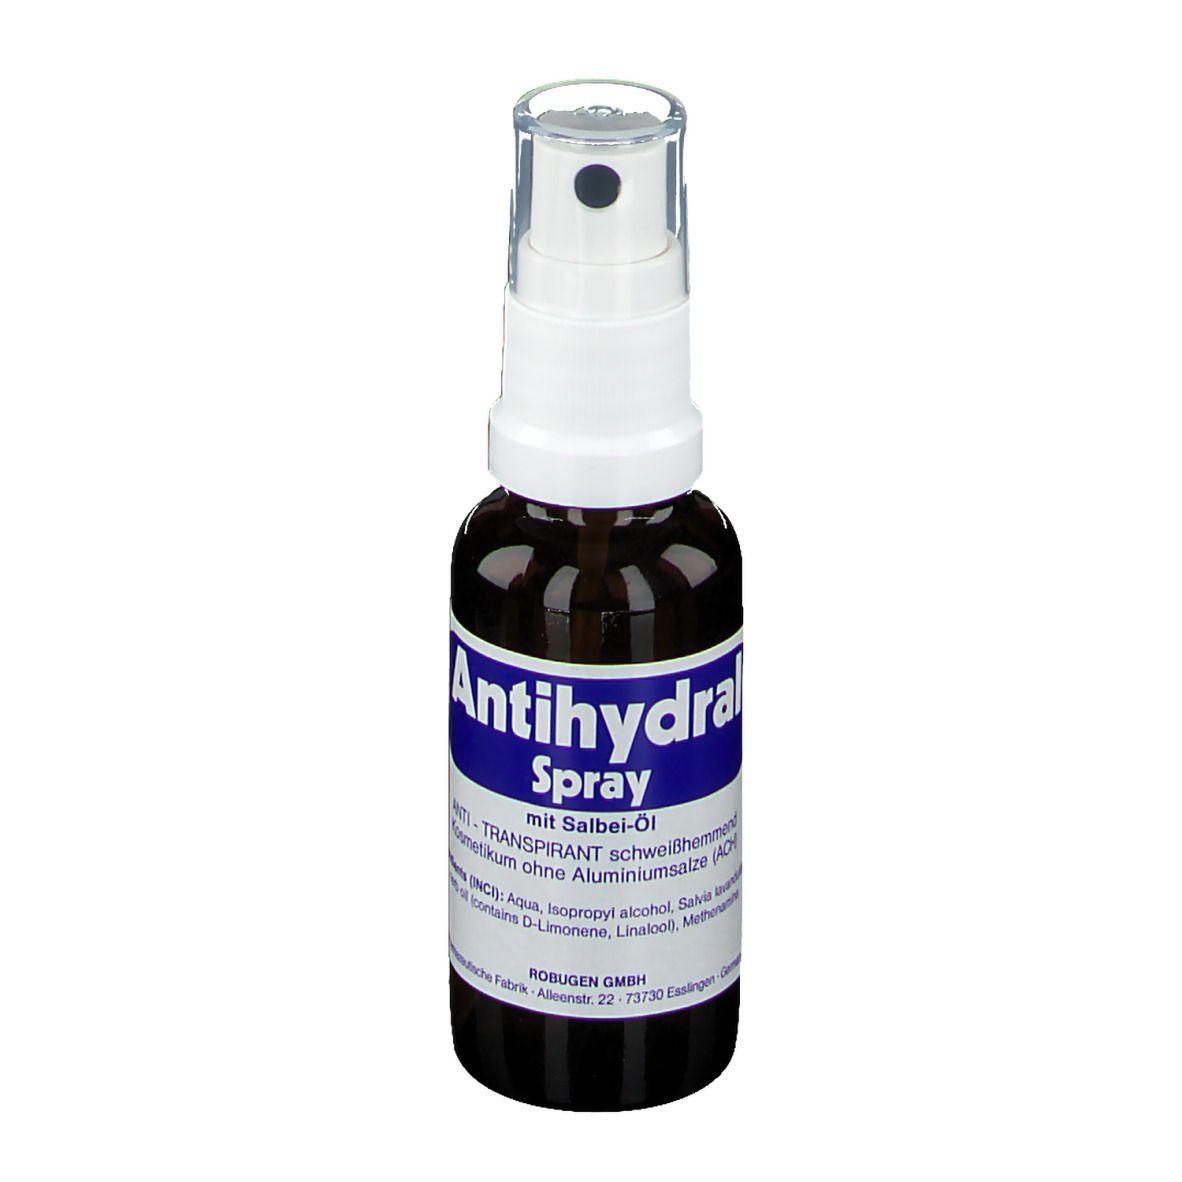 Image of Antihydral Spray